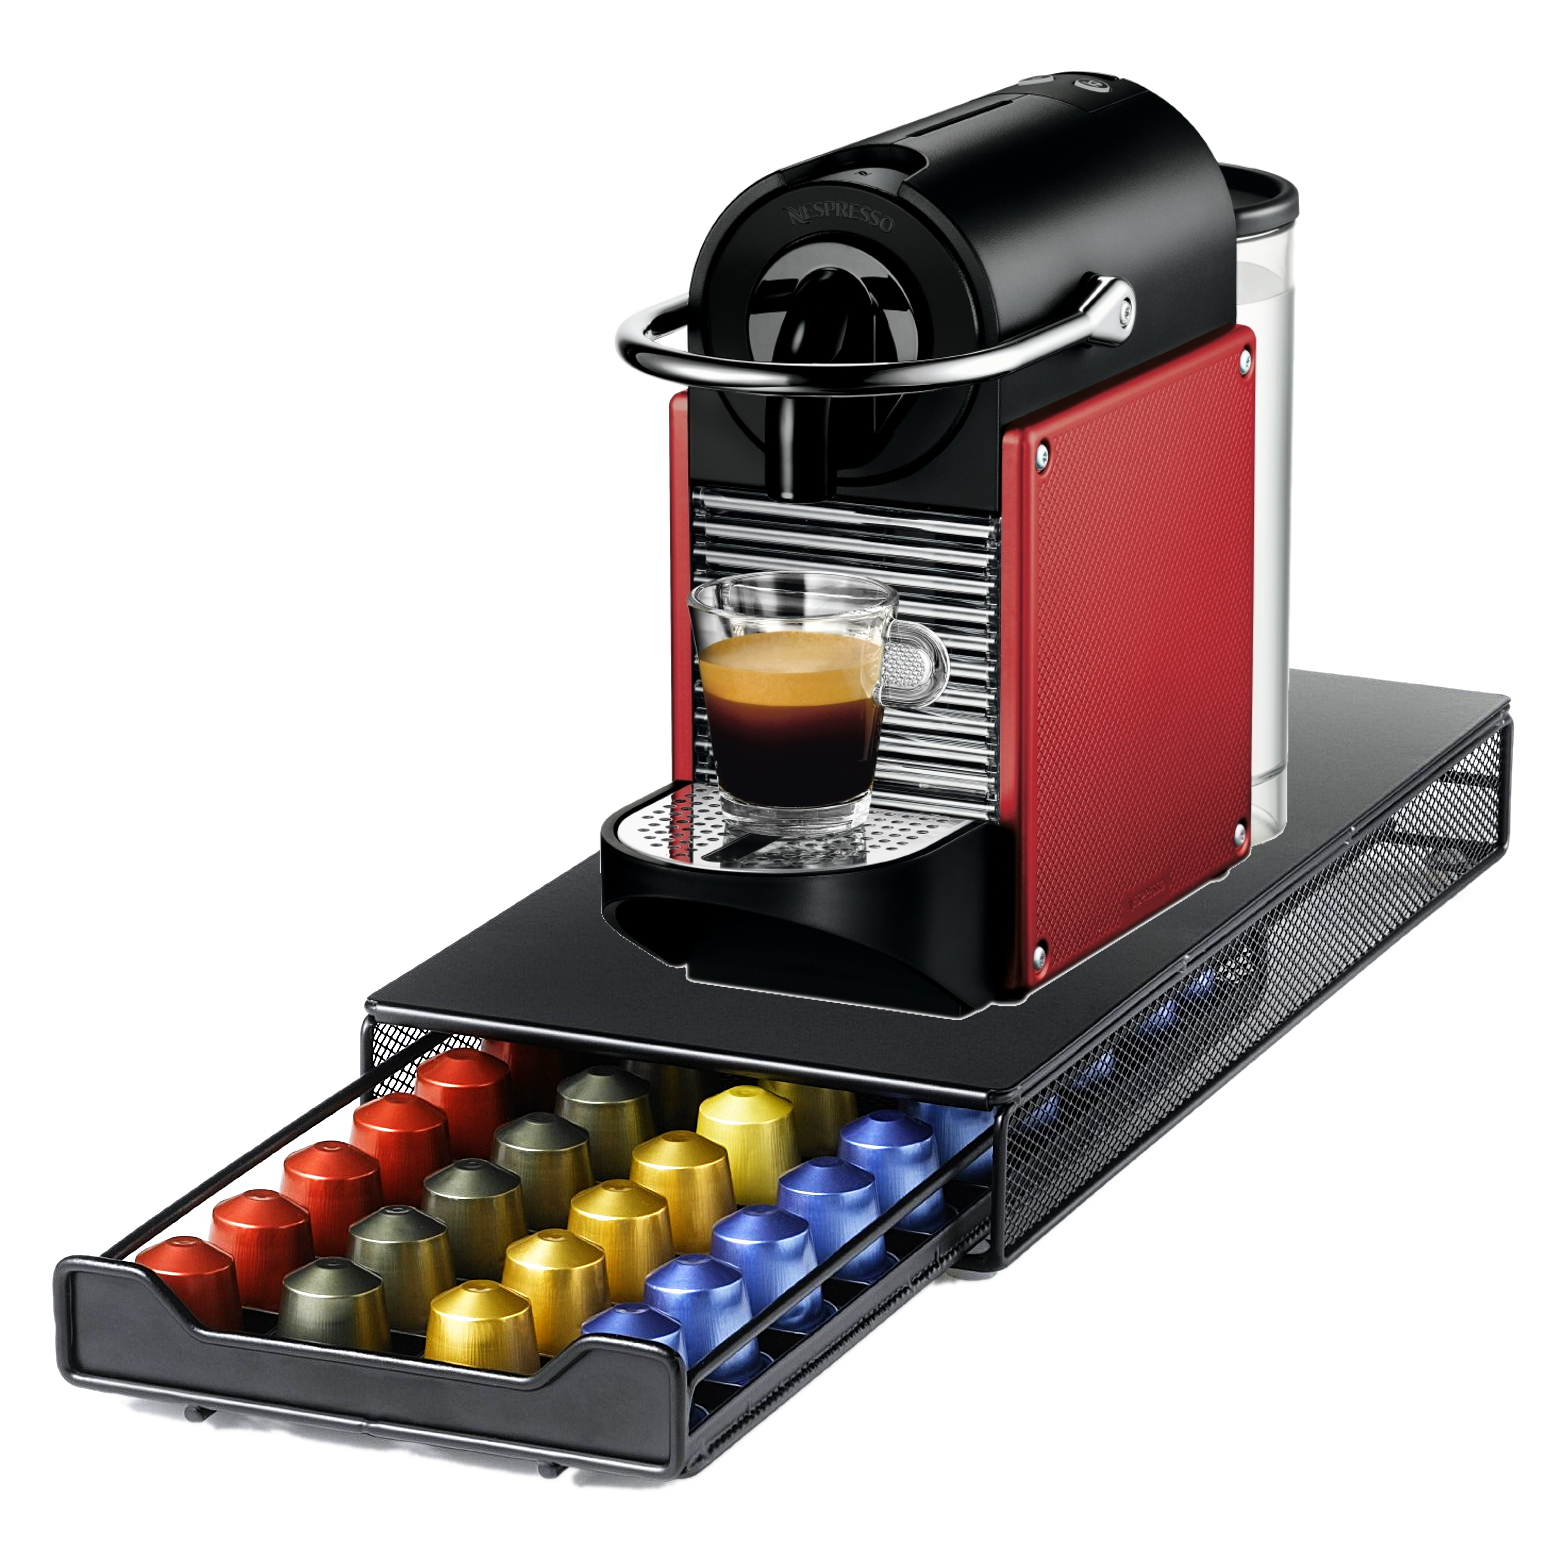 Click here to buy Nespresso Pixie D60 Dark Red Espresso Machine with Bonus 40 Capsule Storage Drawer by Nespresso.